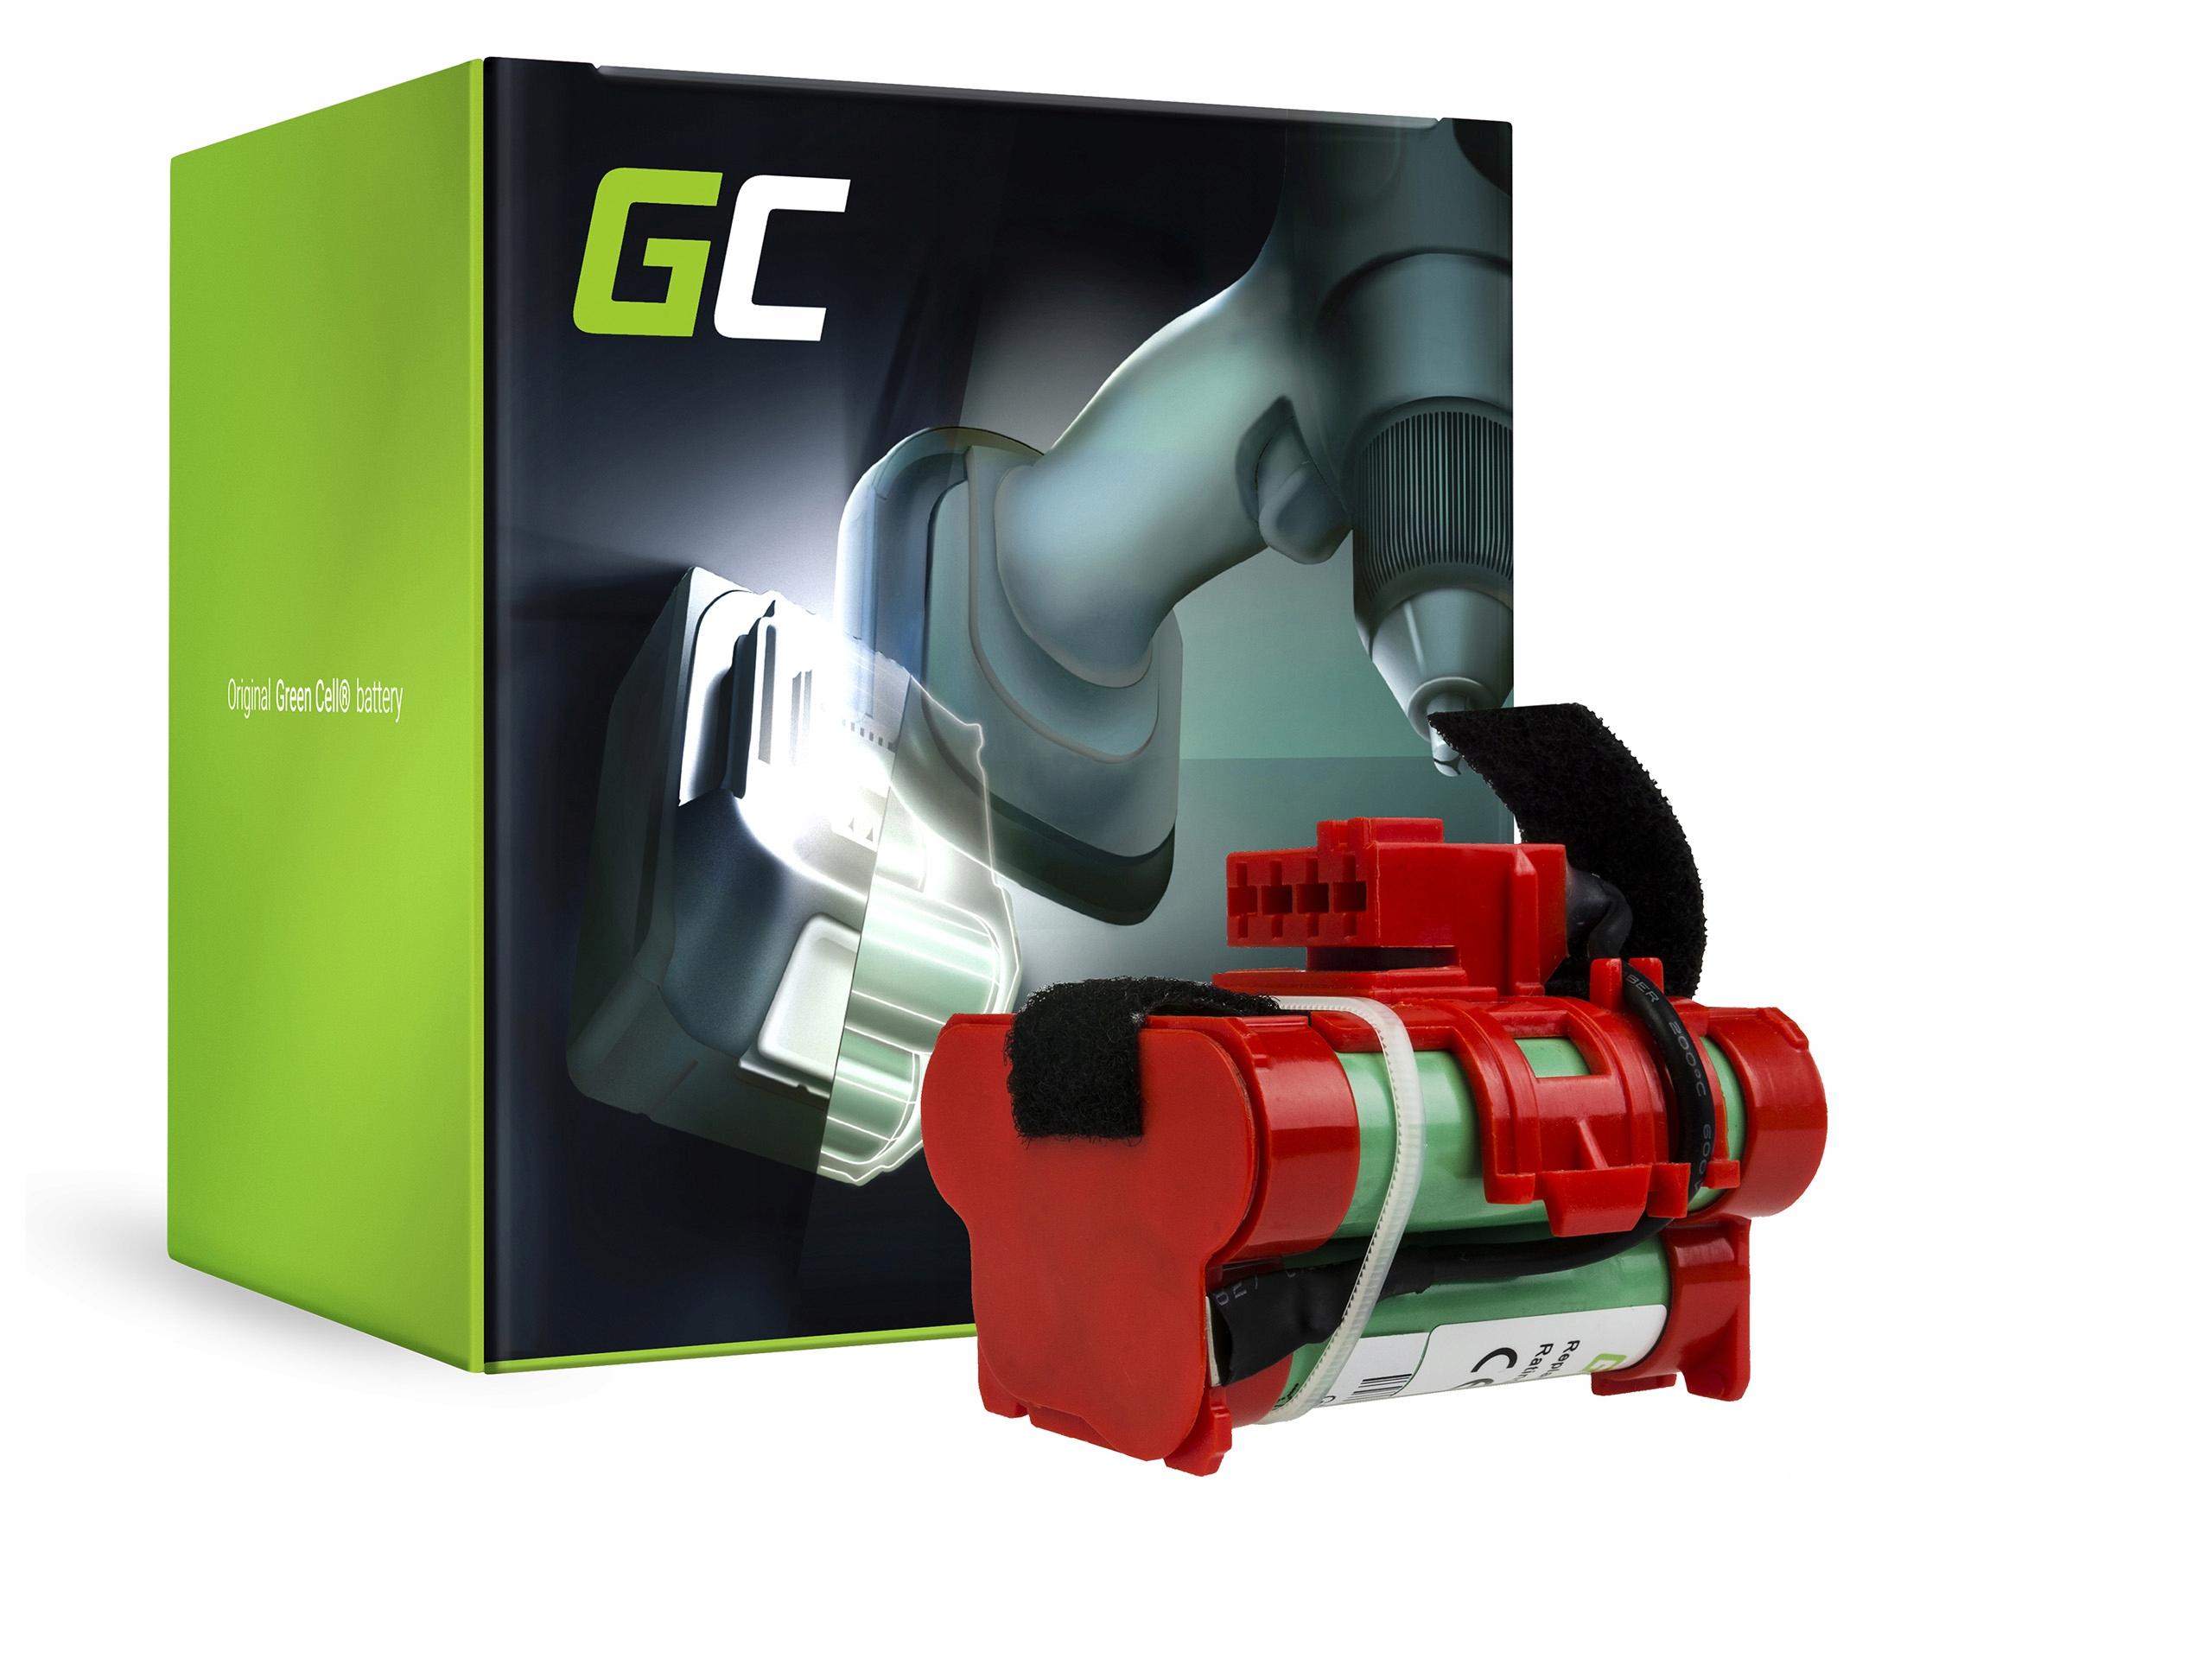 Batérie 18V 2.5 Ah pre Gardena 04071-72